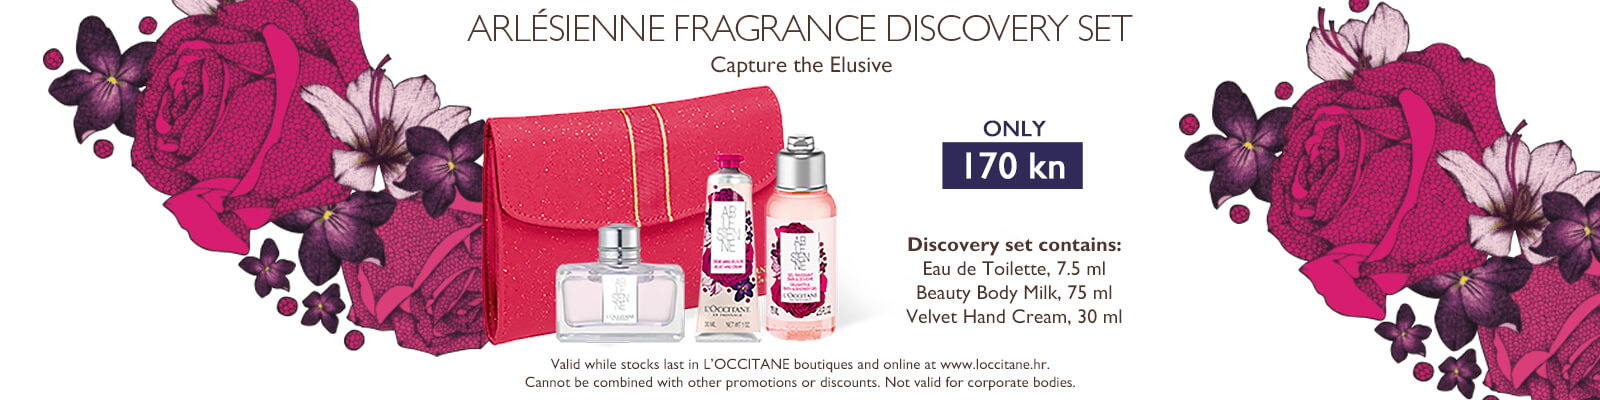 Arlésienne Fragrance Discovery Set